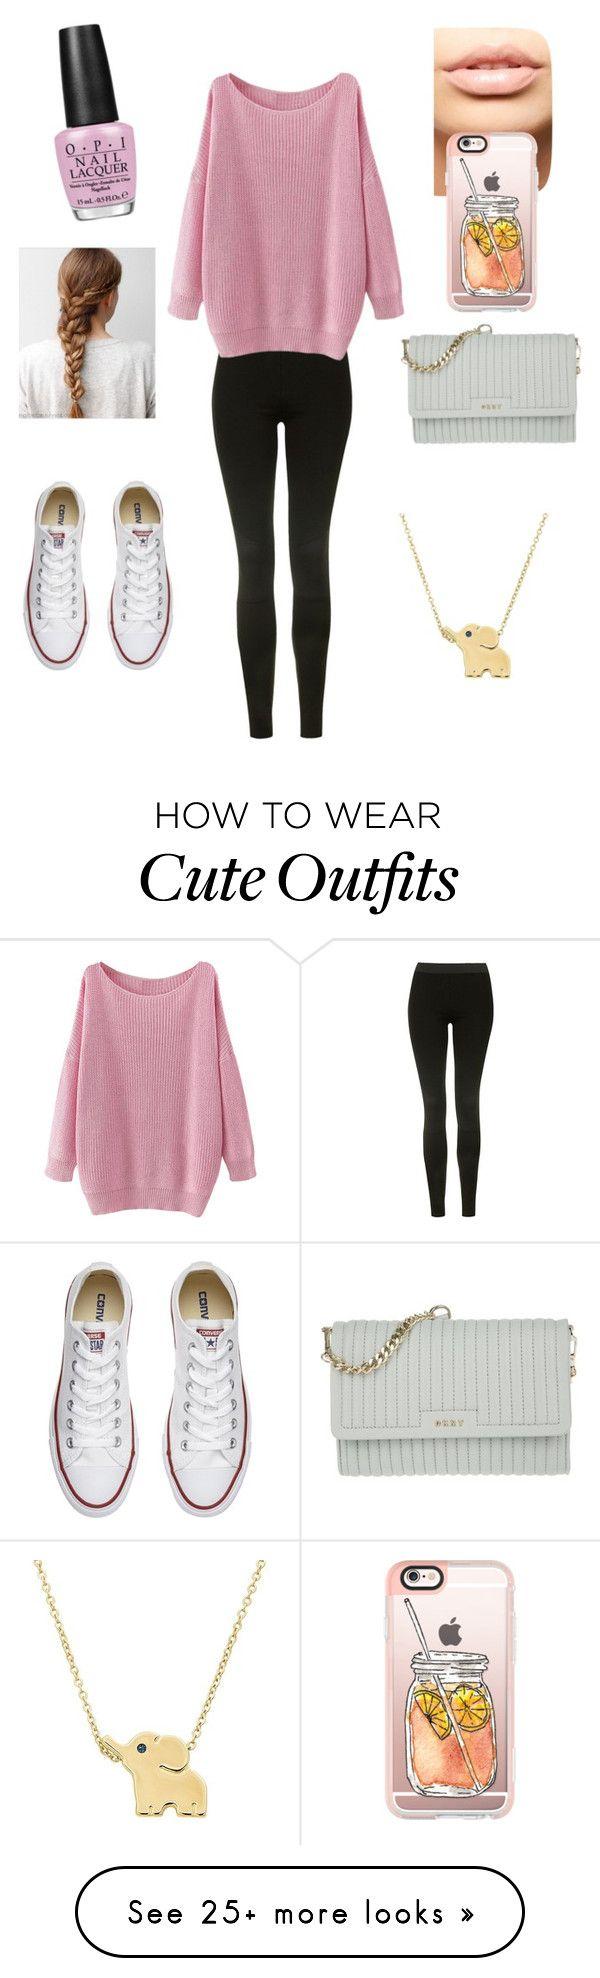 sueter rosa tejido , leggins negros, tenis blancos.